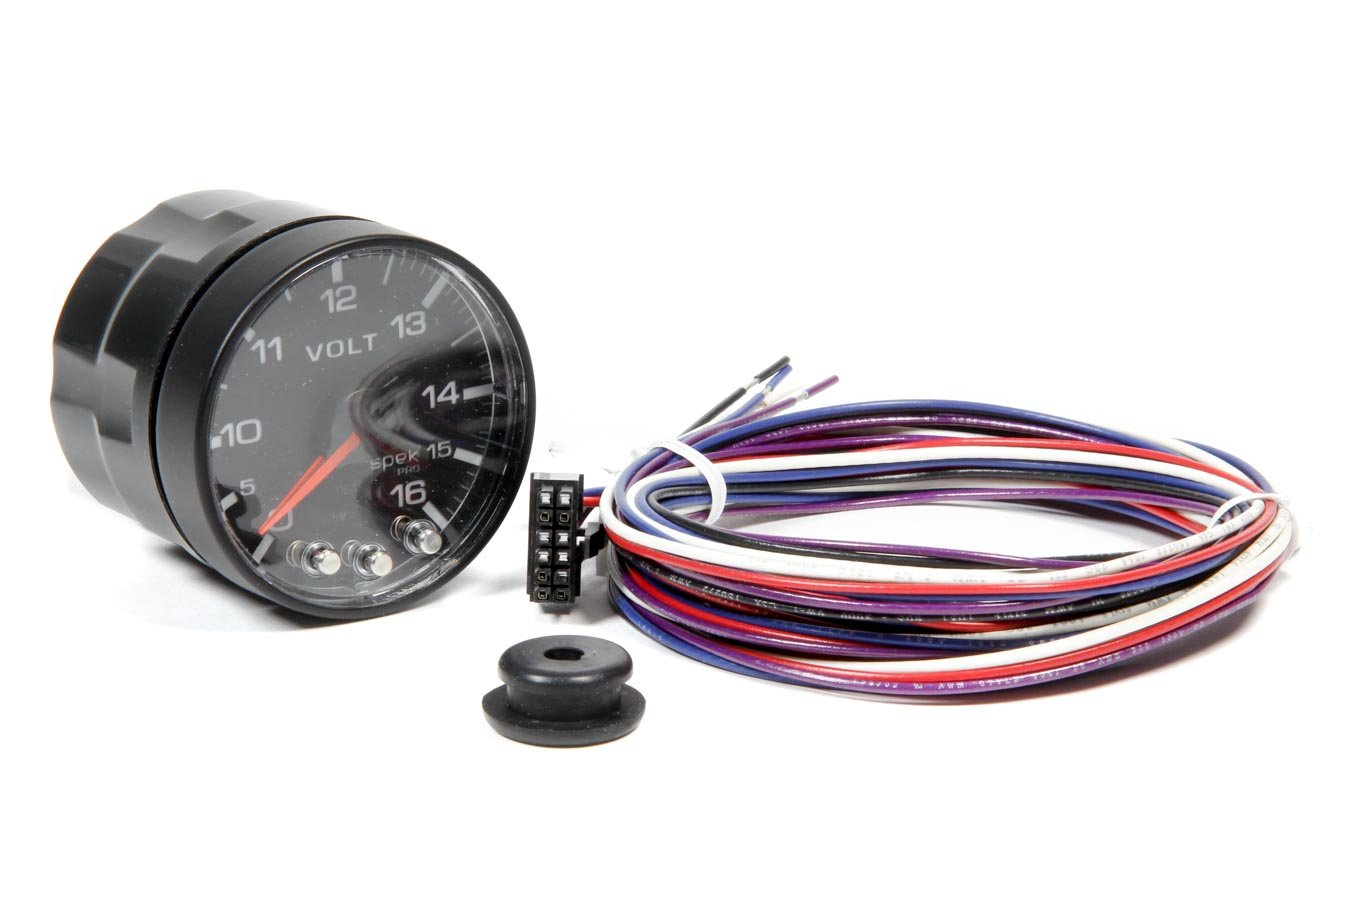 ProParts P344328 Spek-Pro 2-1/16'' Electric Voltmeter Gauge (52.4mm, 0-16 Volts)